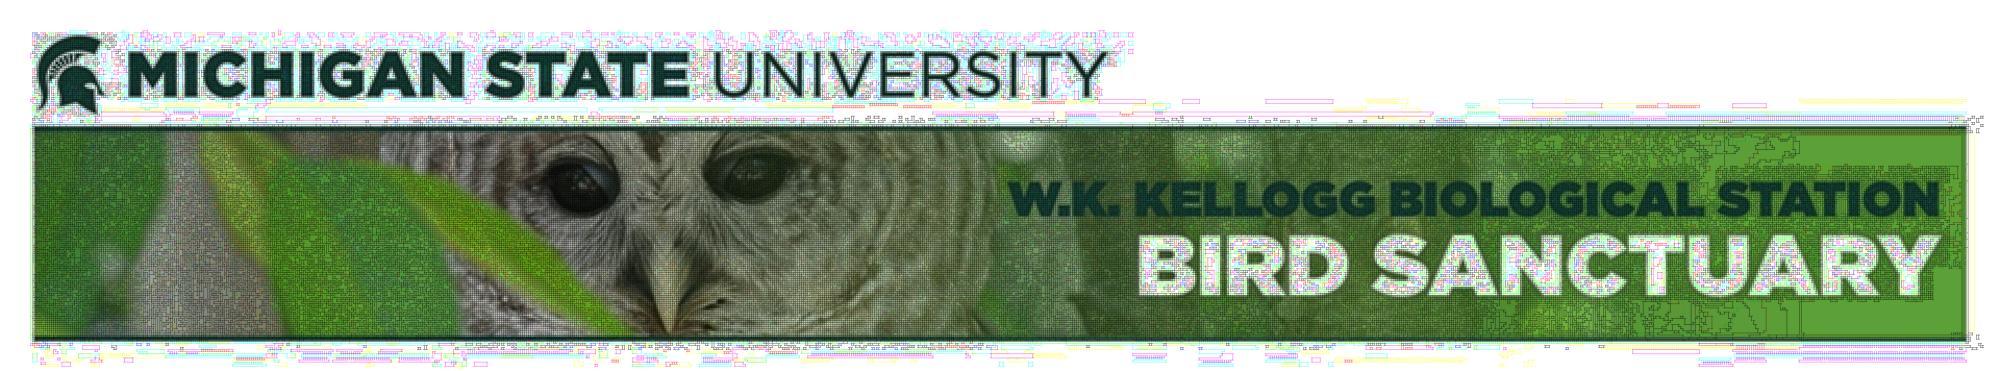 Michigan State University Kellogg Biological Station Kellogg Bird Sanctuary with Barred Owl.